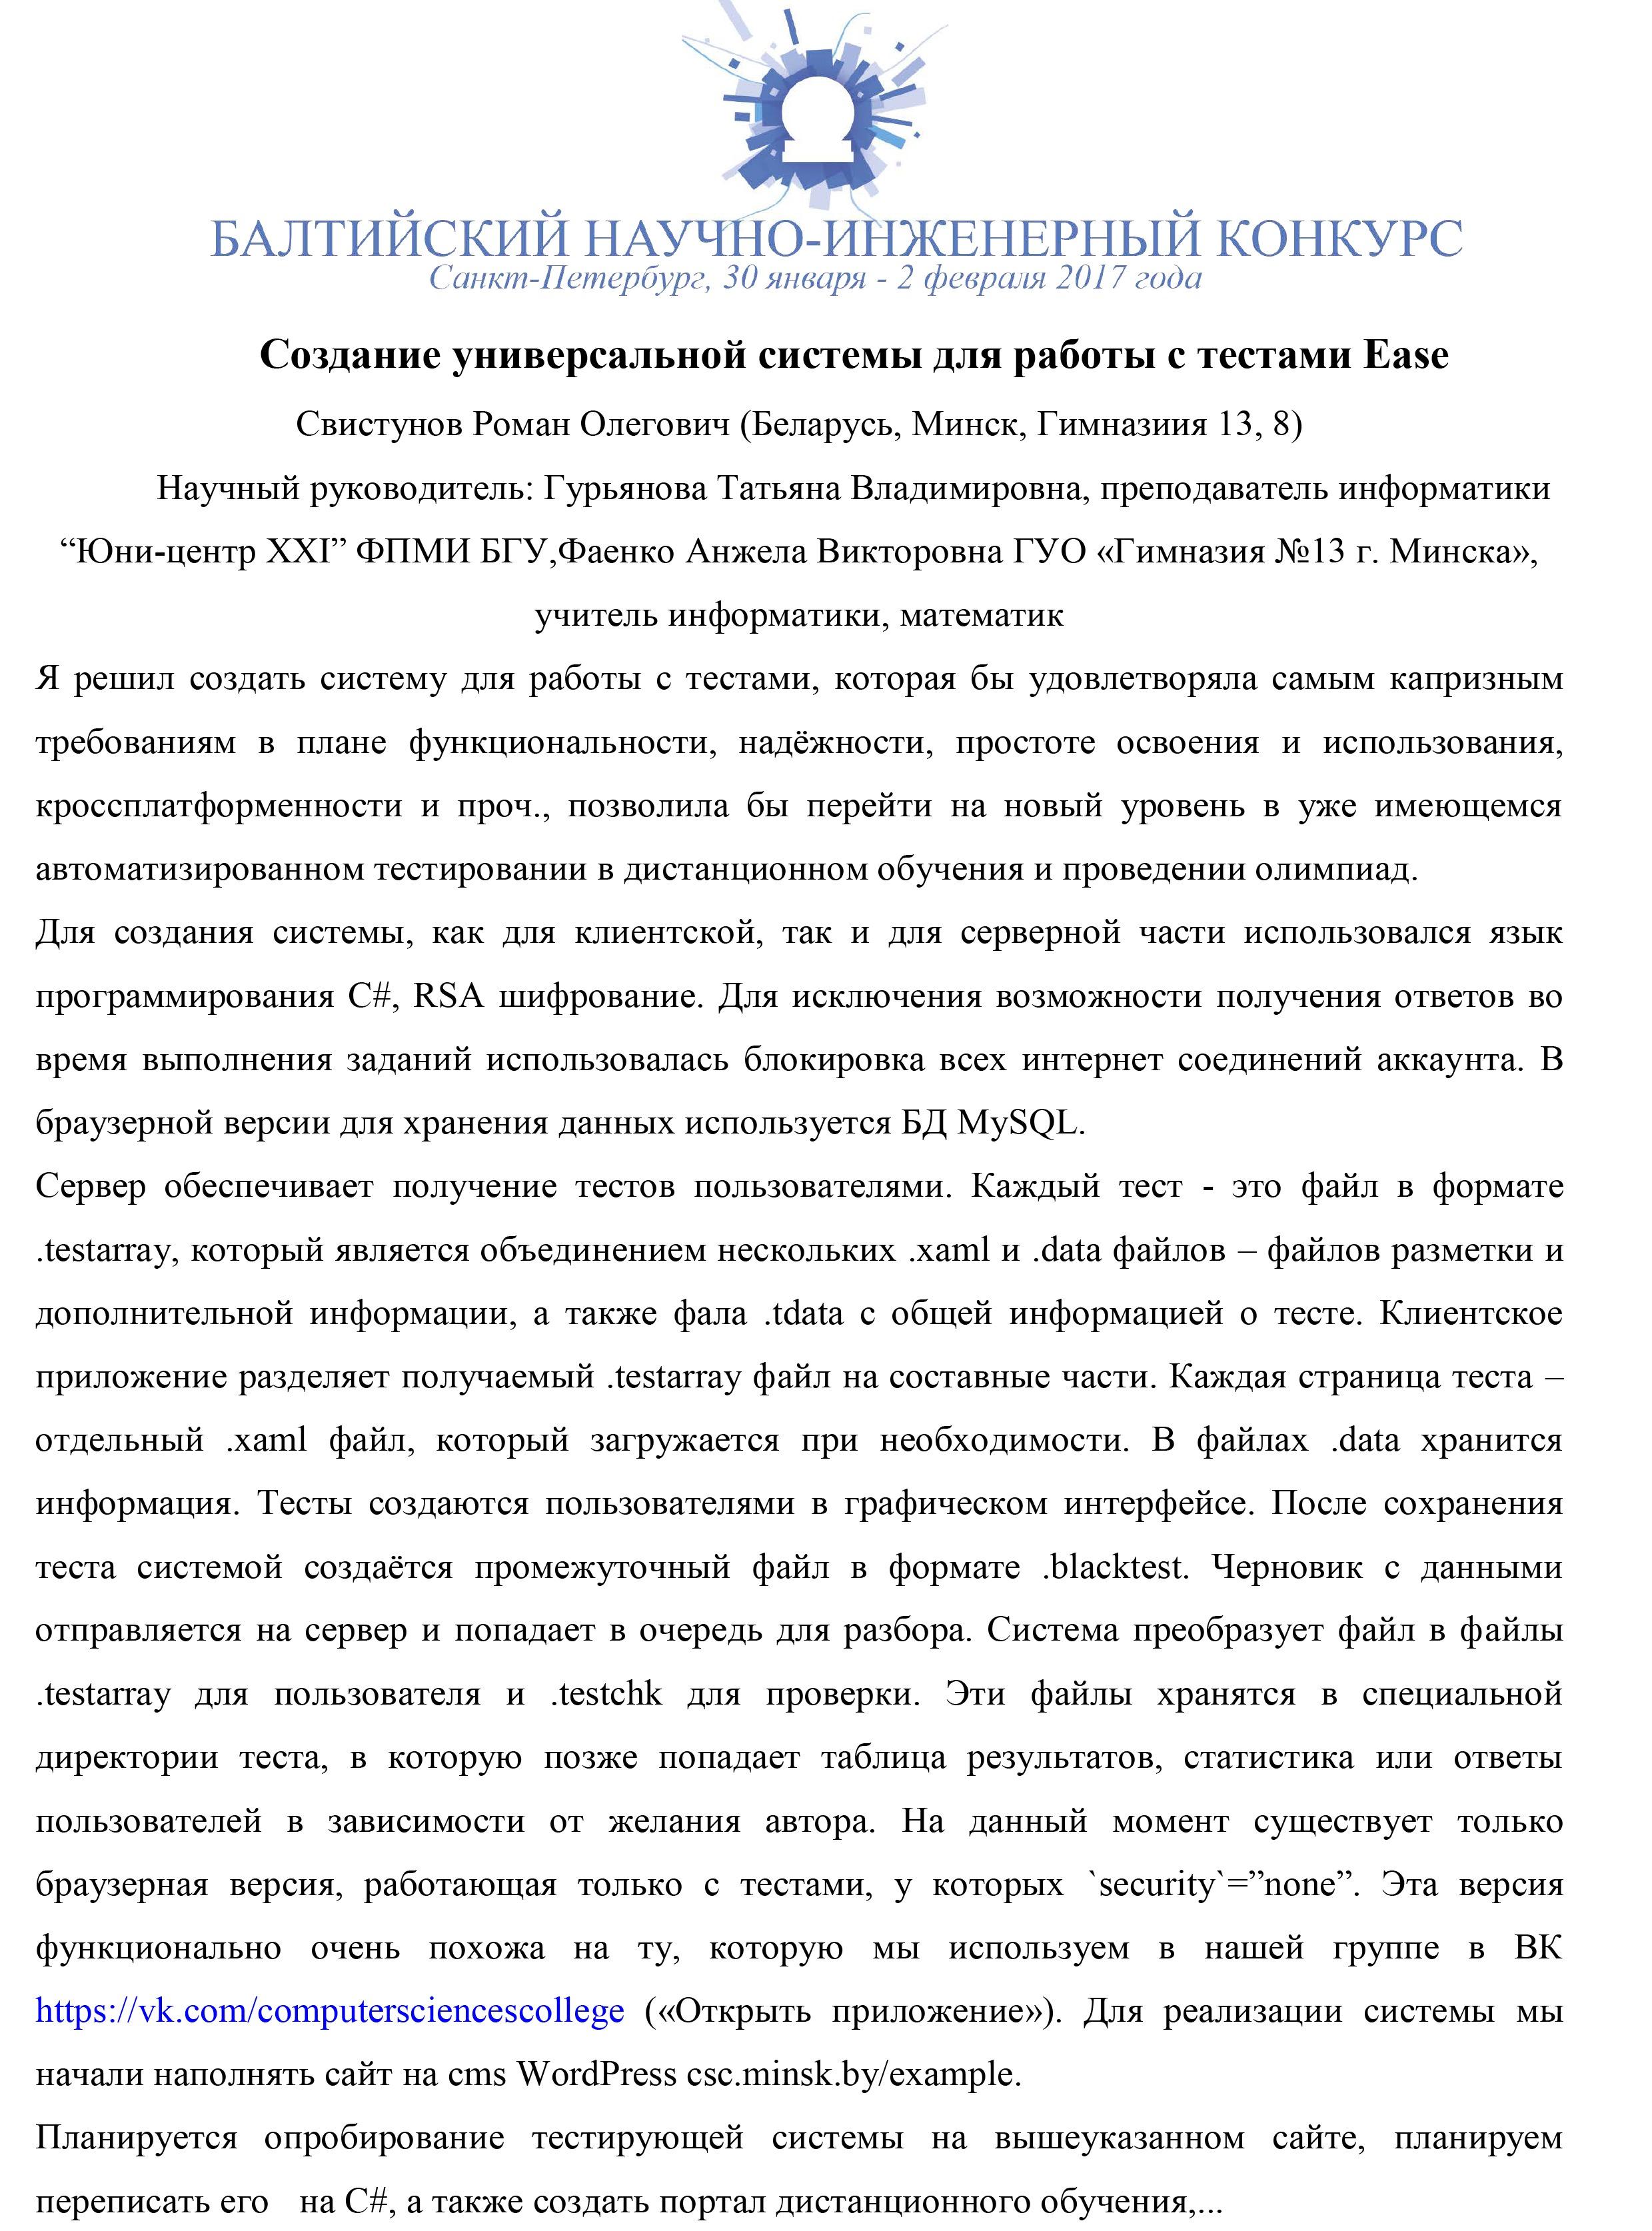 Сборник тезисов-113